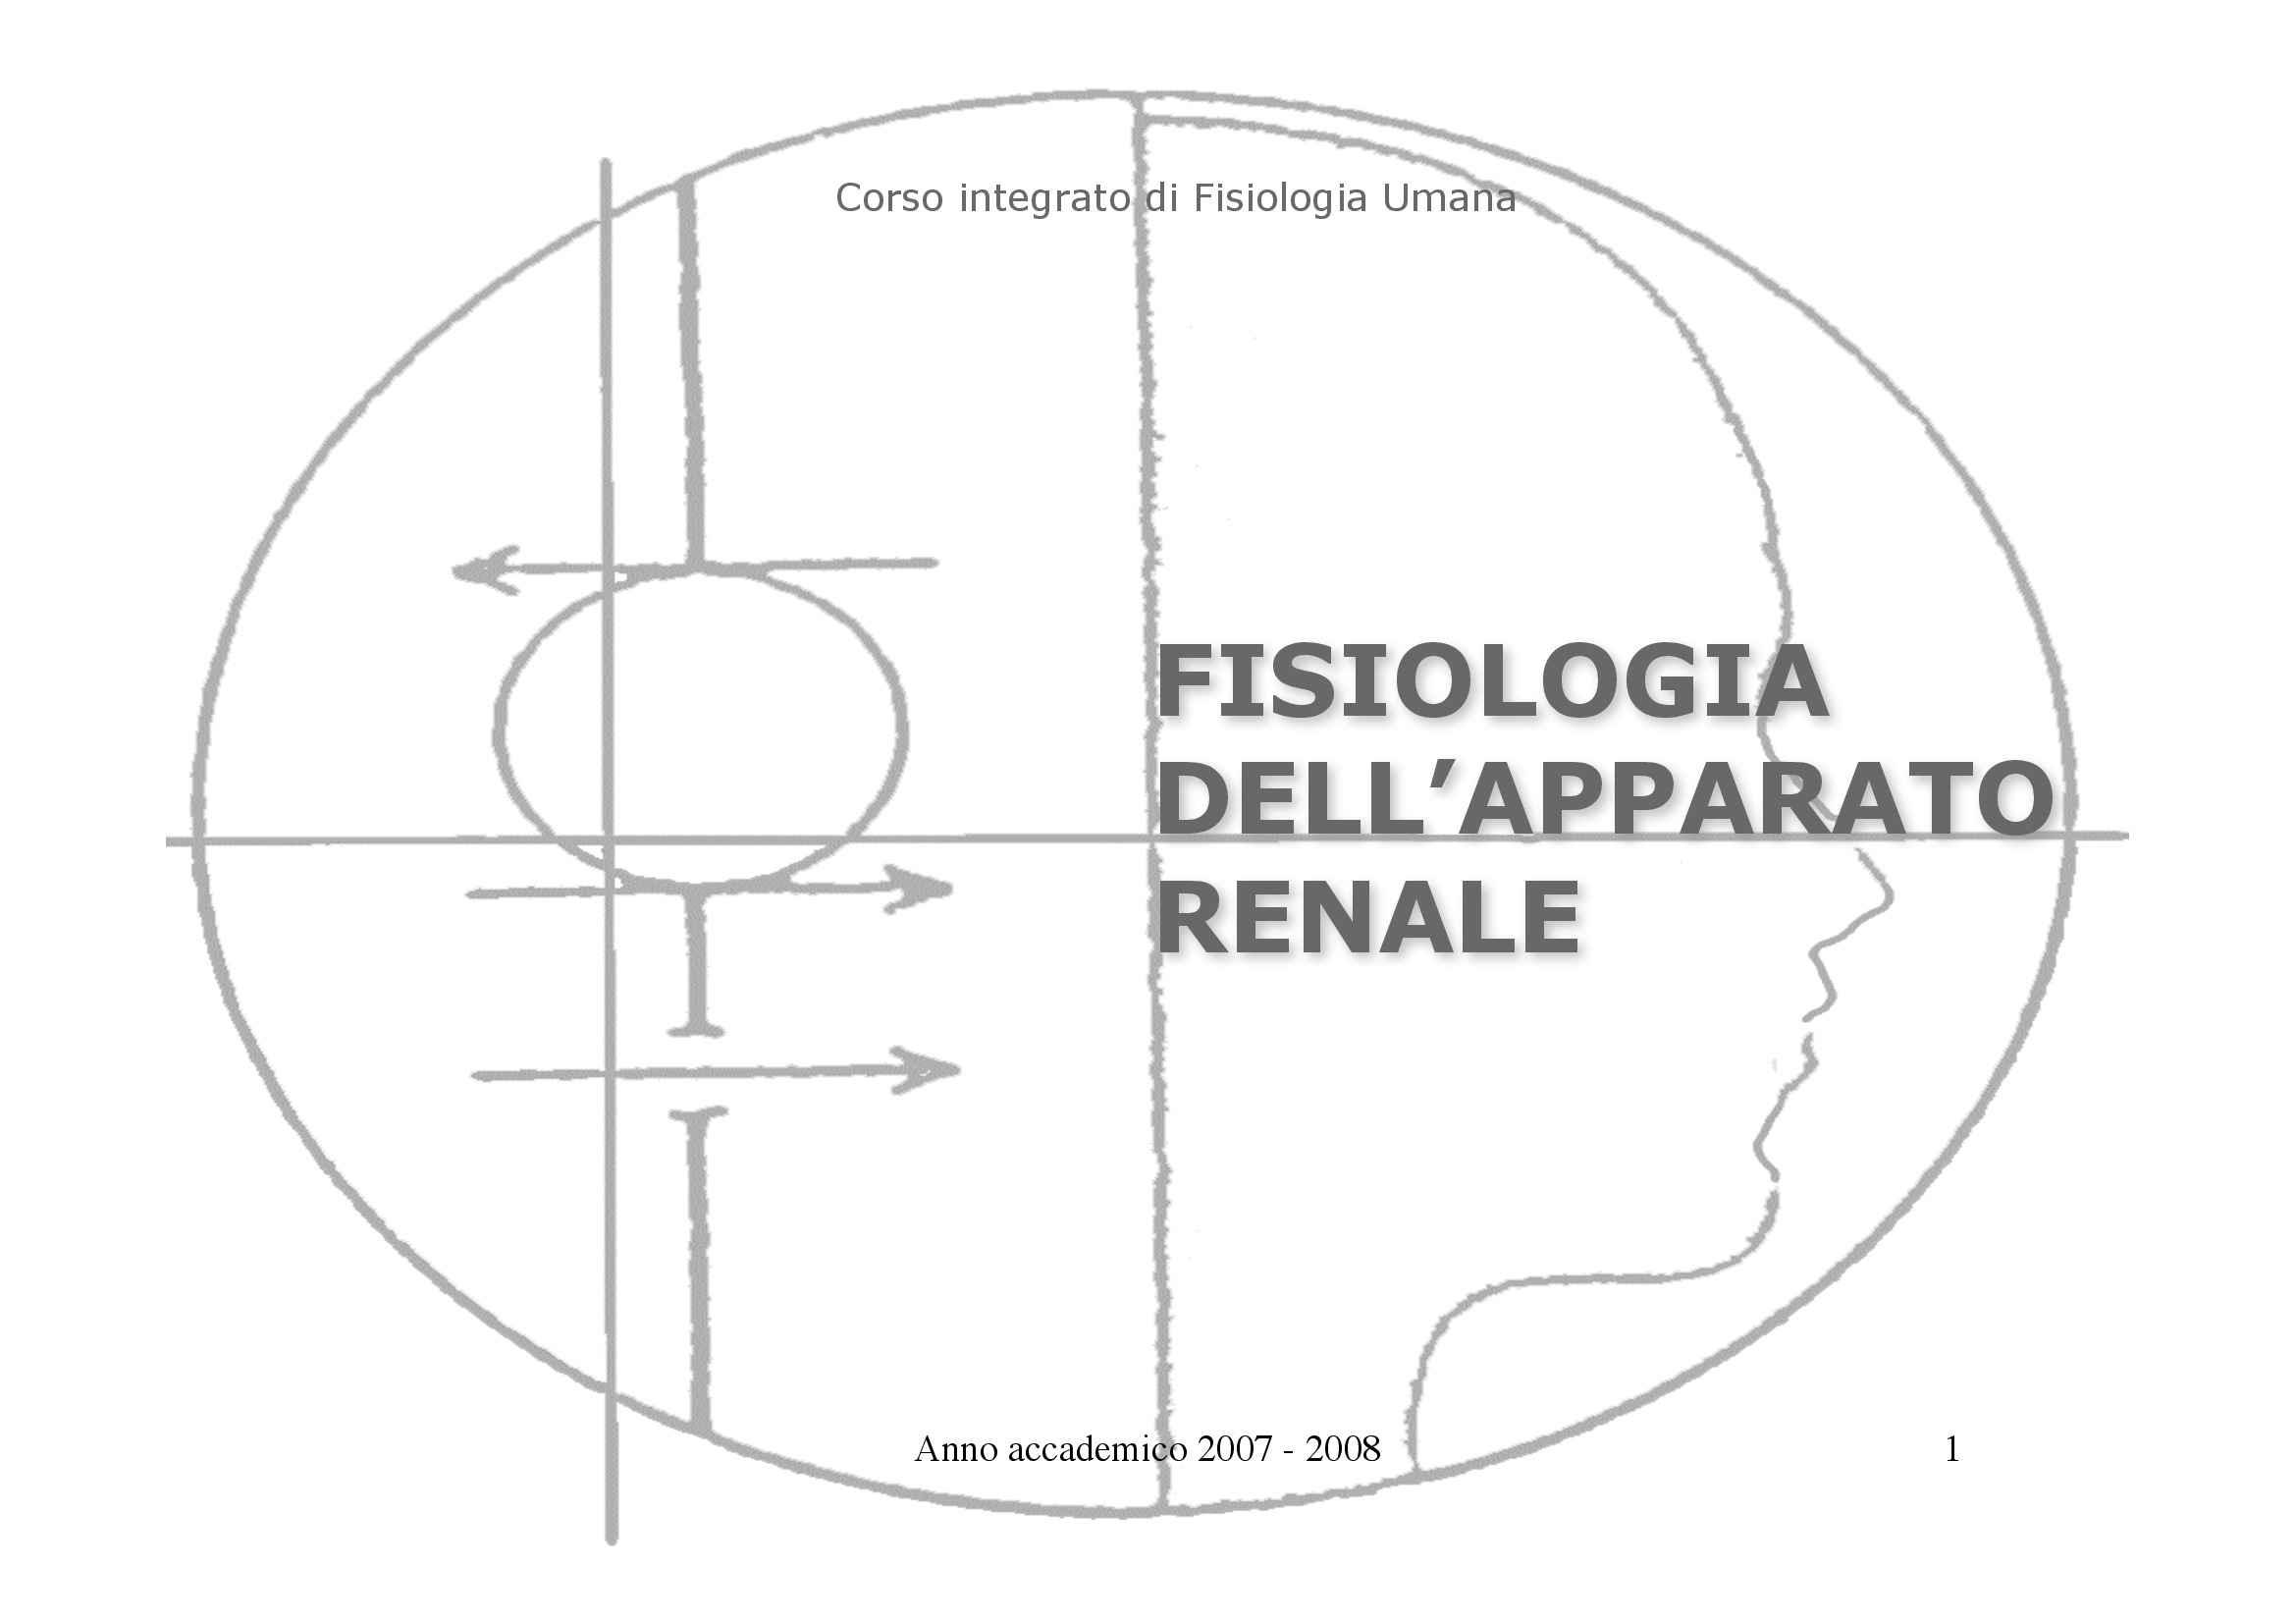 dispensa G. Cibelli Fisiologia Umana I